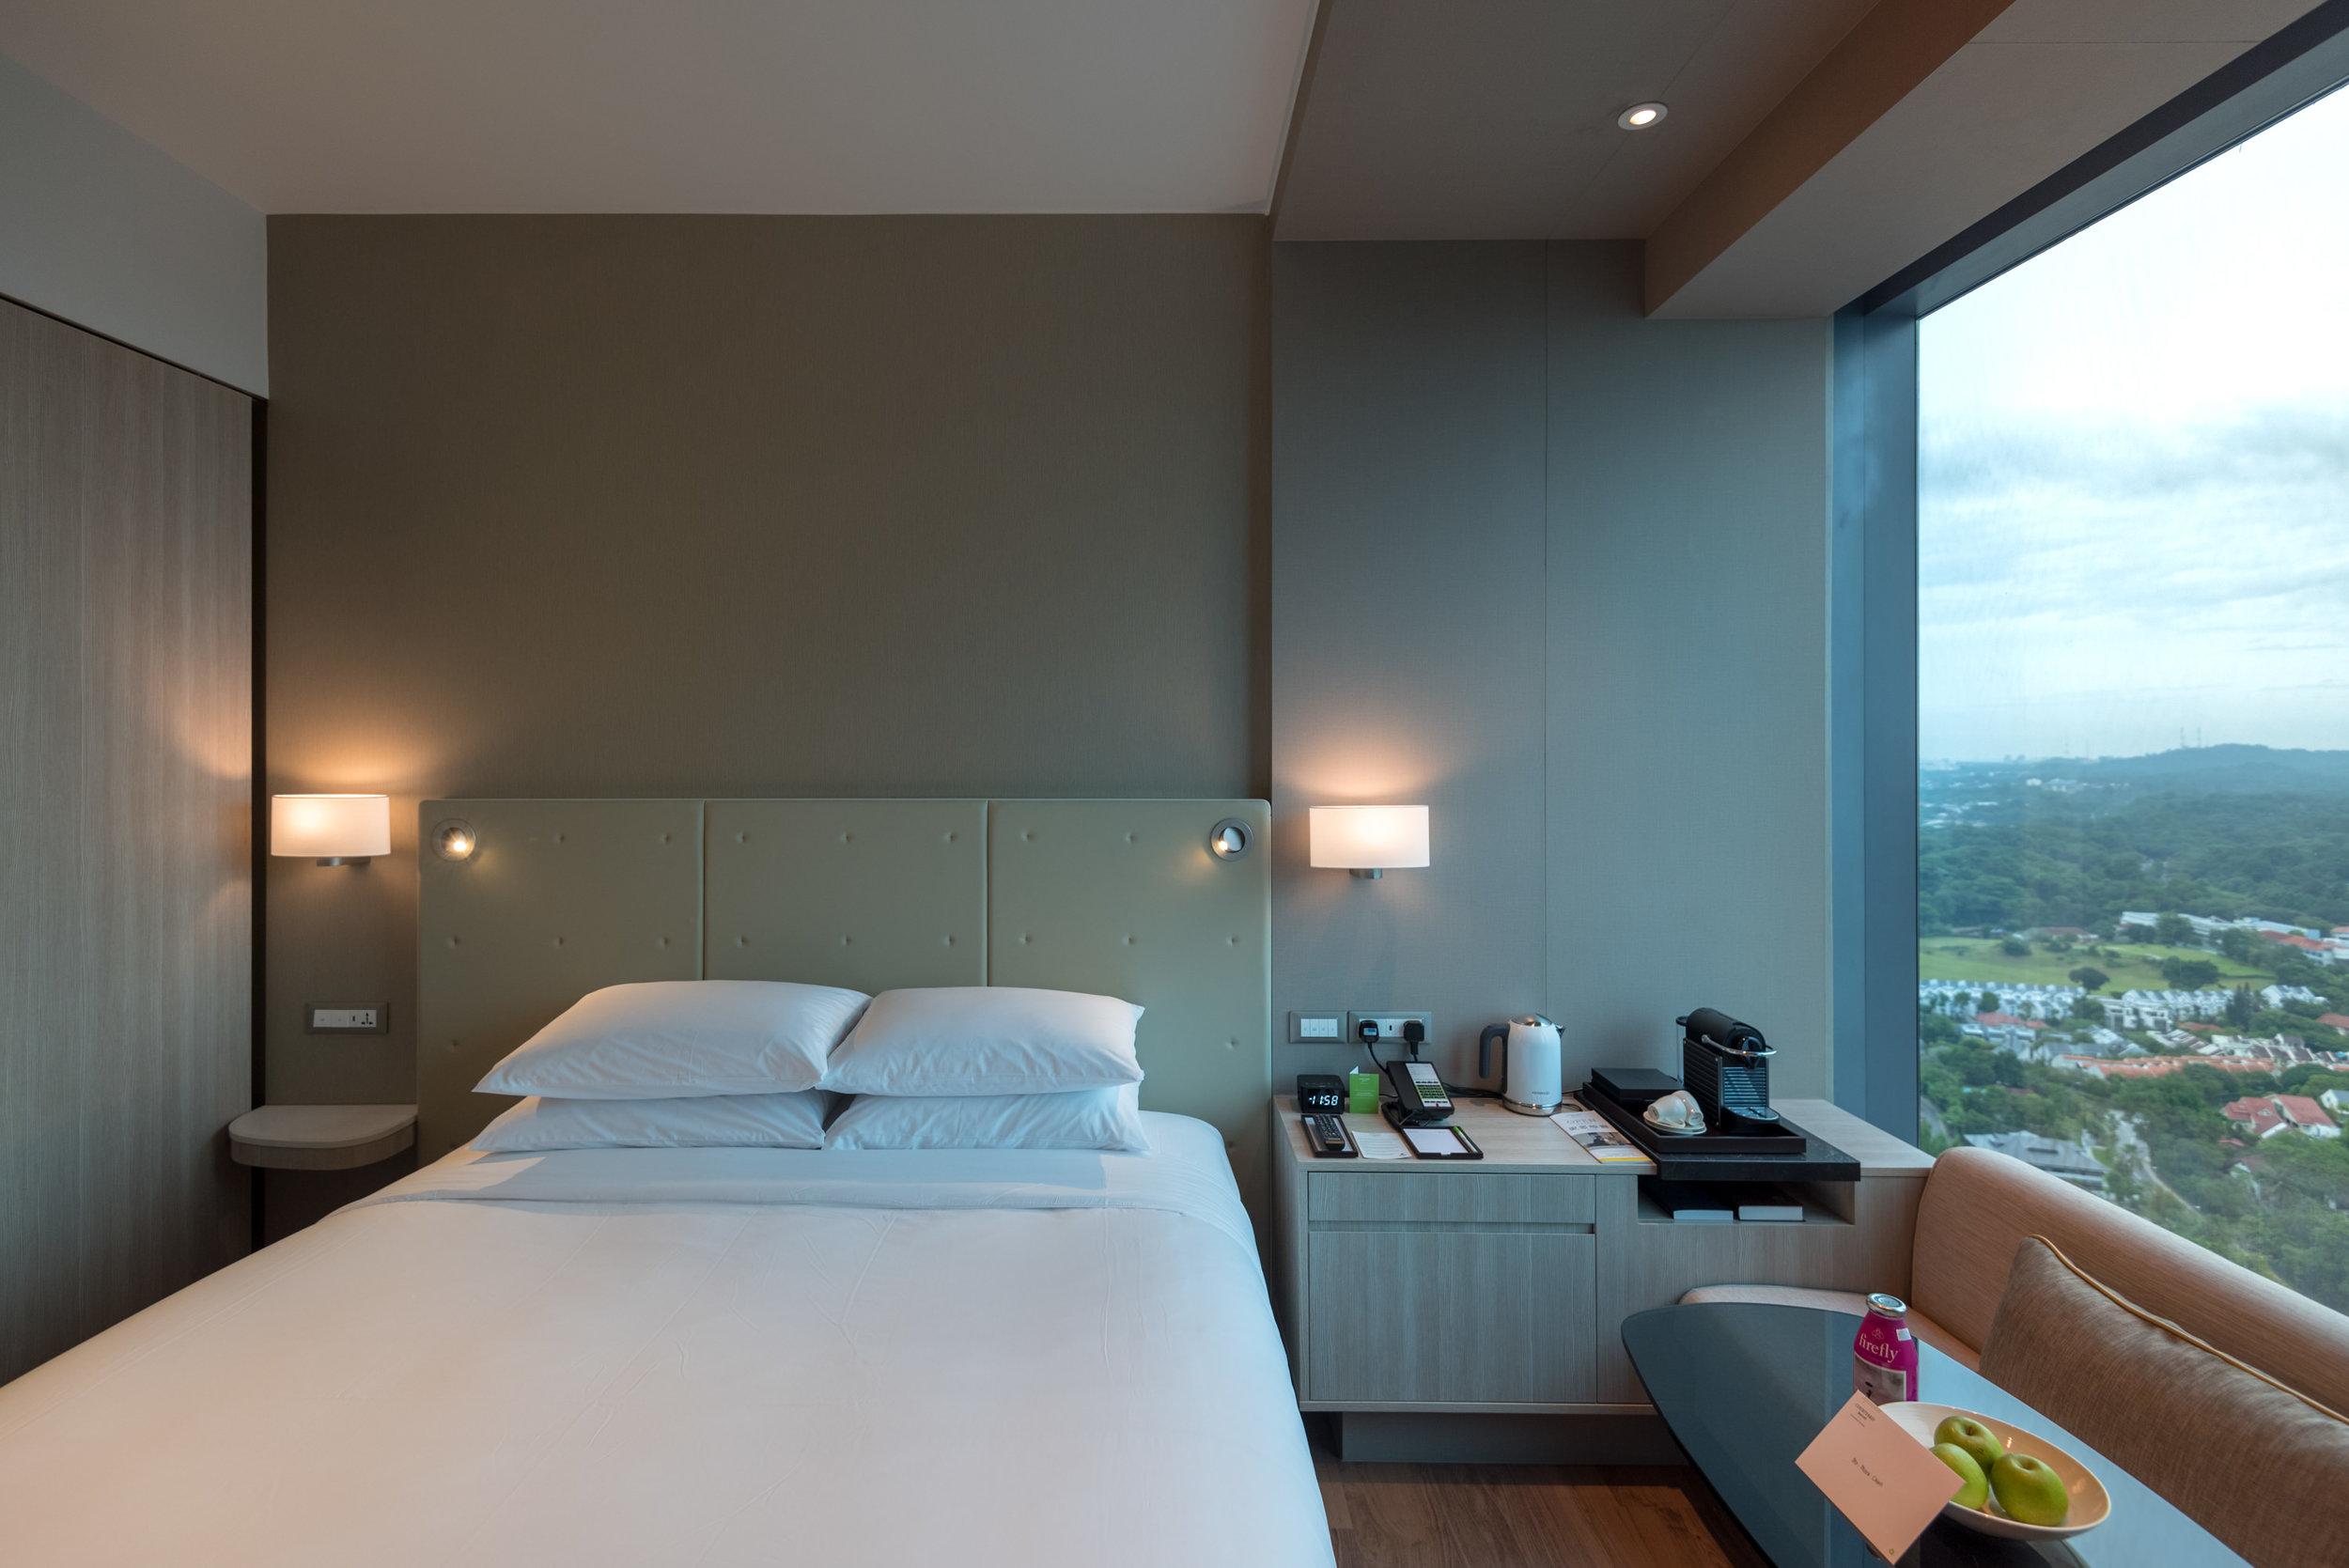 King-size Bed  Premier Skyline Room - Courtyard by Marriott Singapore Novena